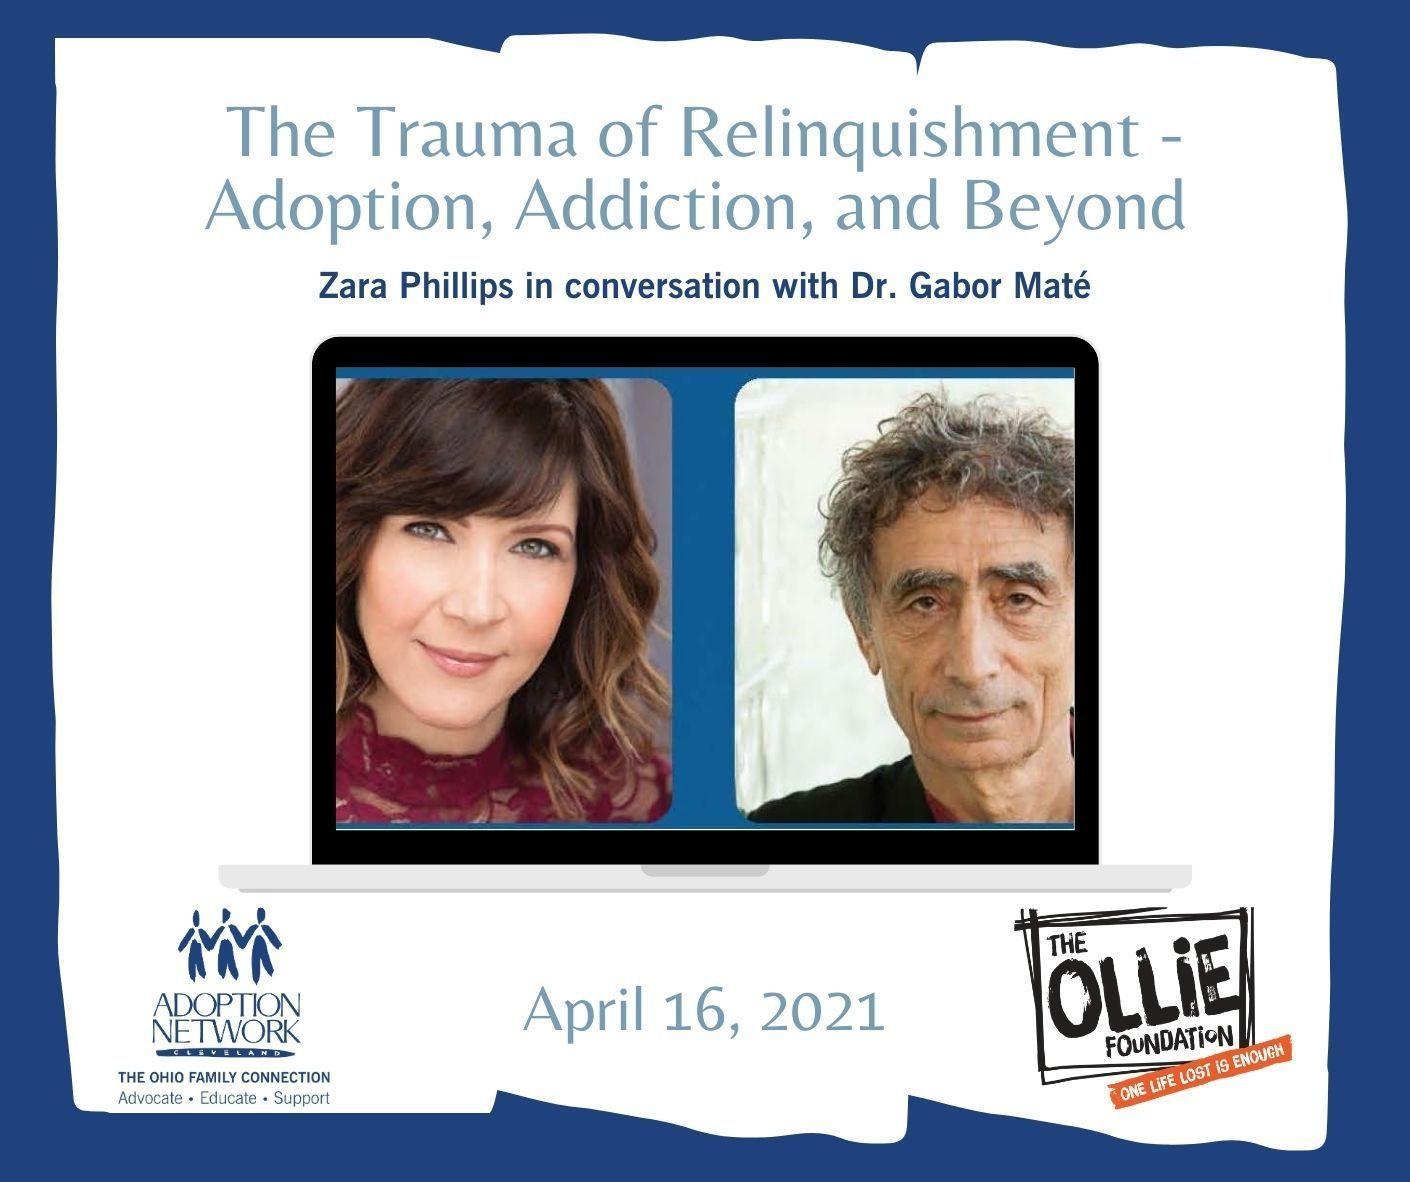 The Trauma of Relinquishment - Adoption, Addiction & Beyond